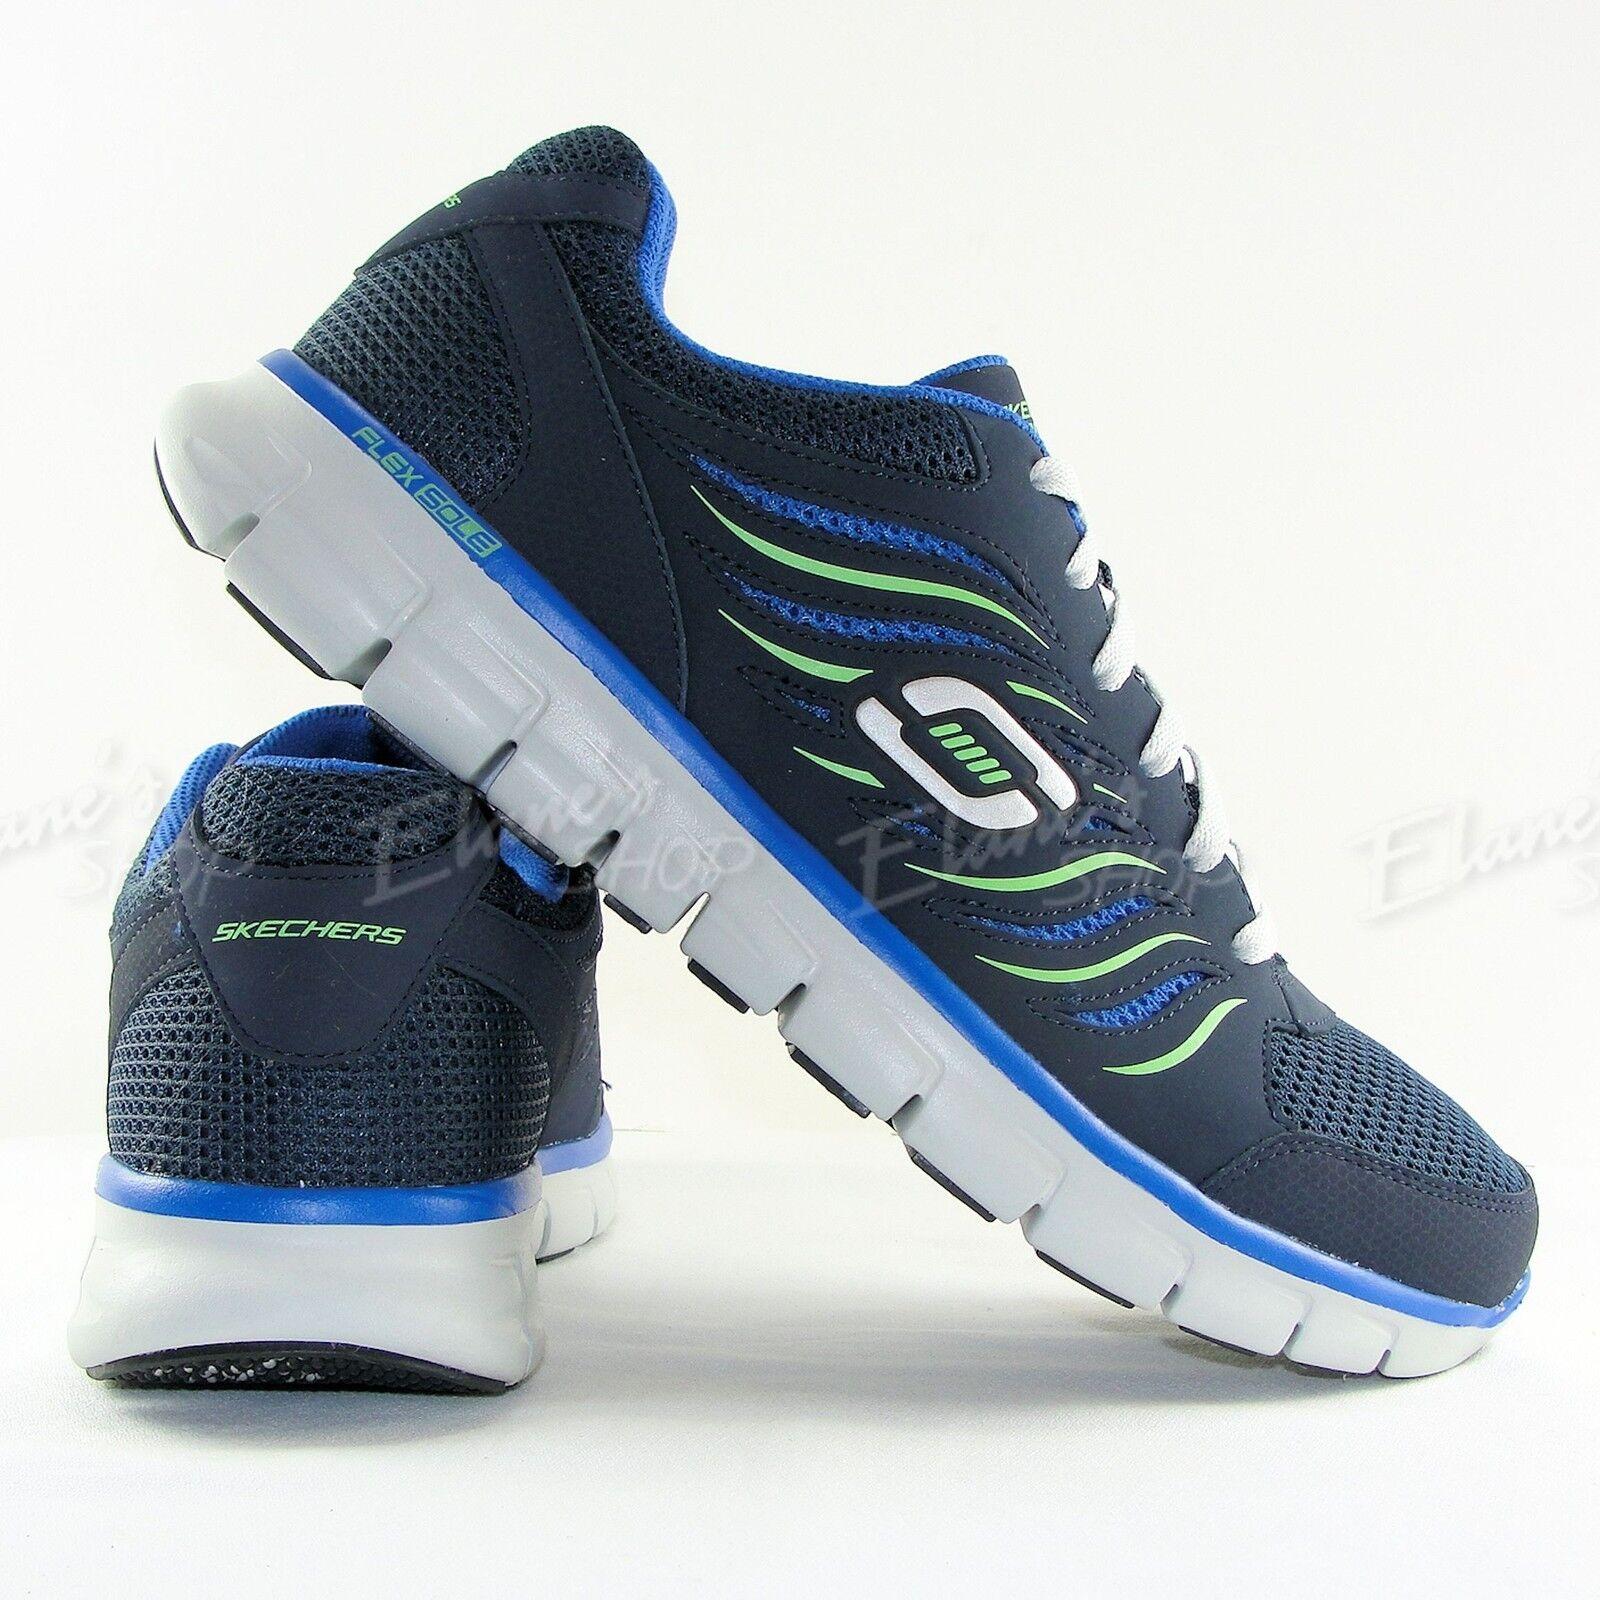 Men's SKECHERS 51182 NVBL Synergy Sneakers Shoes NEW FlexSole Navy Green Gray